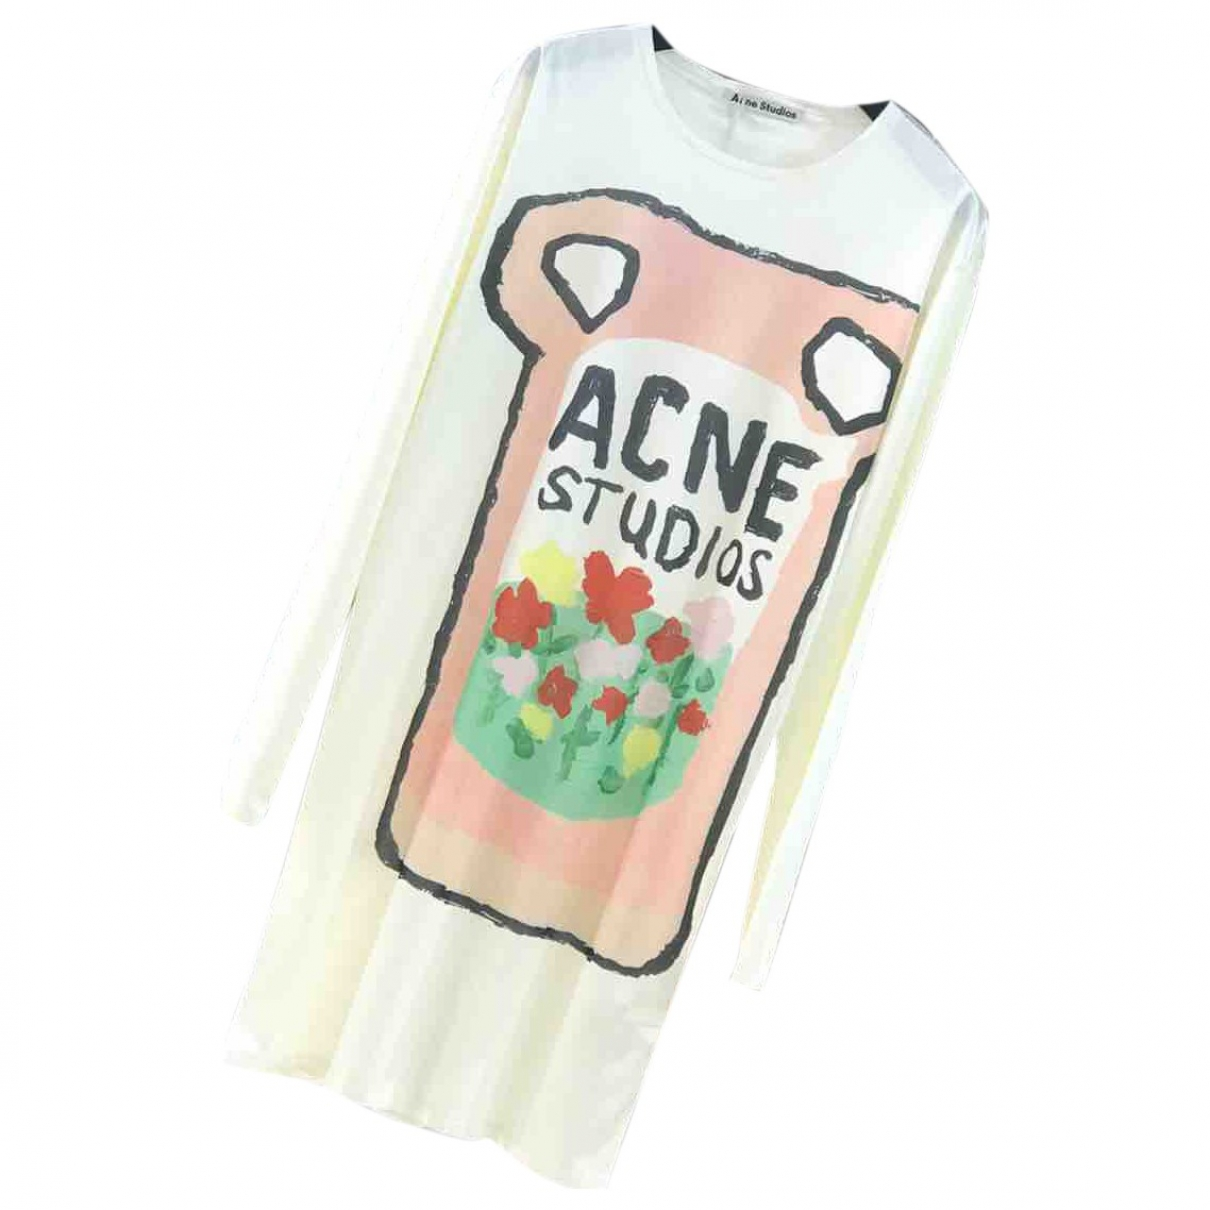 Acne Studios \N Ecru dress for Women S International